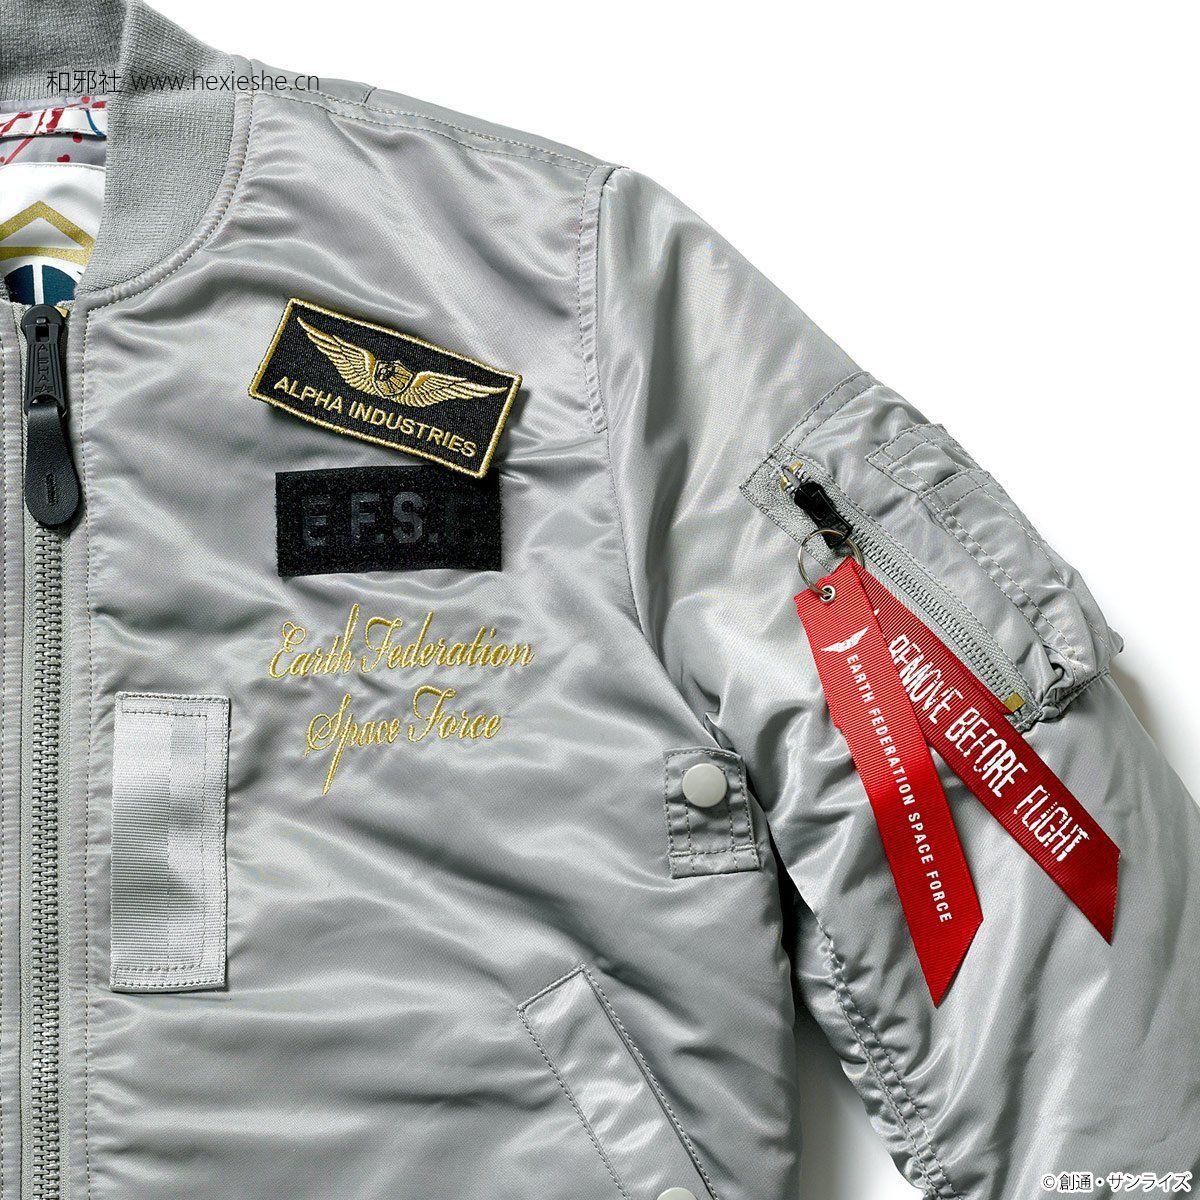 STRICT-G ALPHA INDUSTRIES MA-1 机动战士高达 飞行夹克